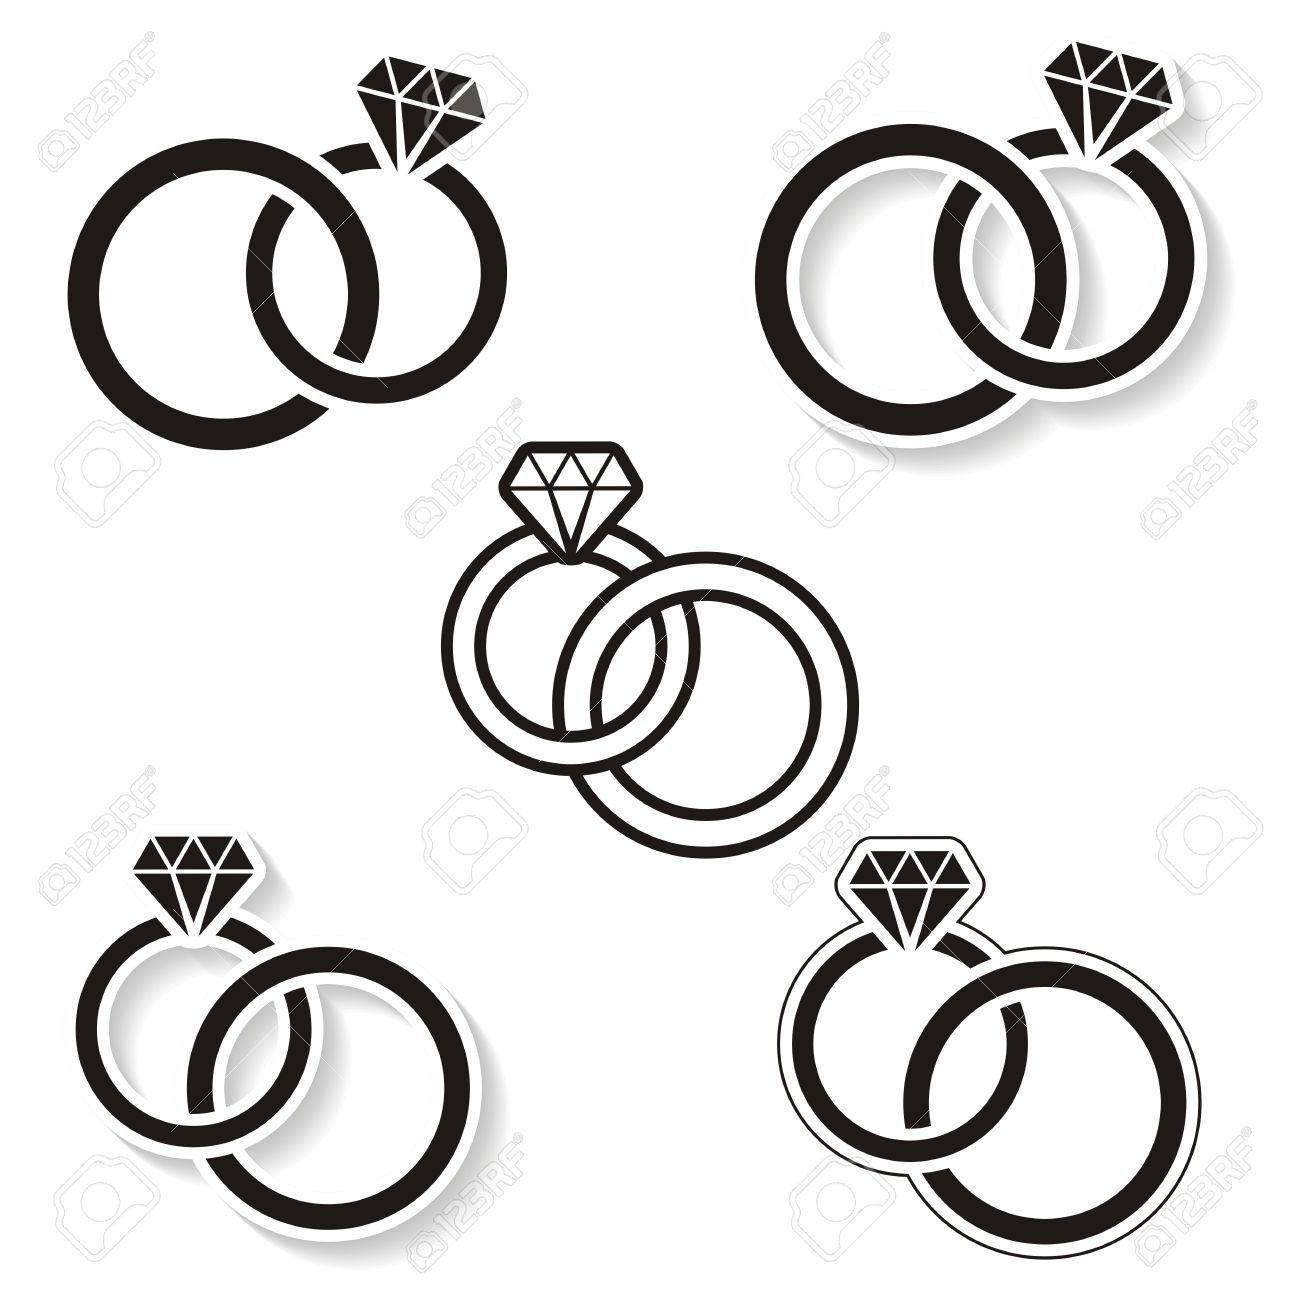 Clip Art Wedding Rings Drawing Coole Trauringe Schwarze Trauringe Gravur Ehering